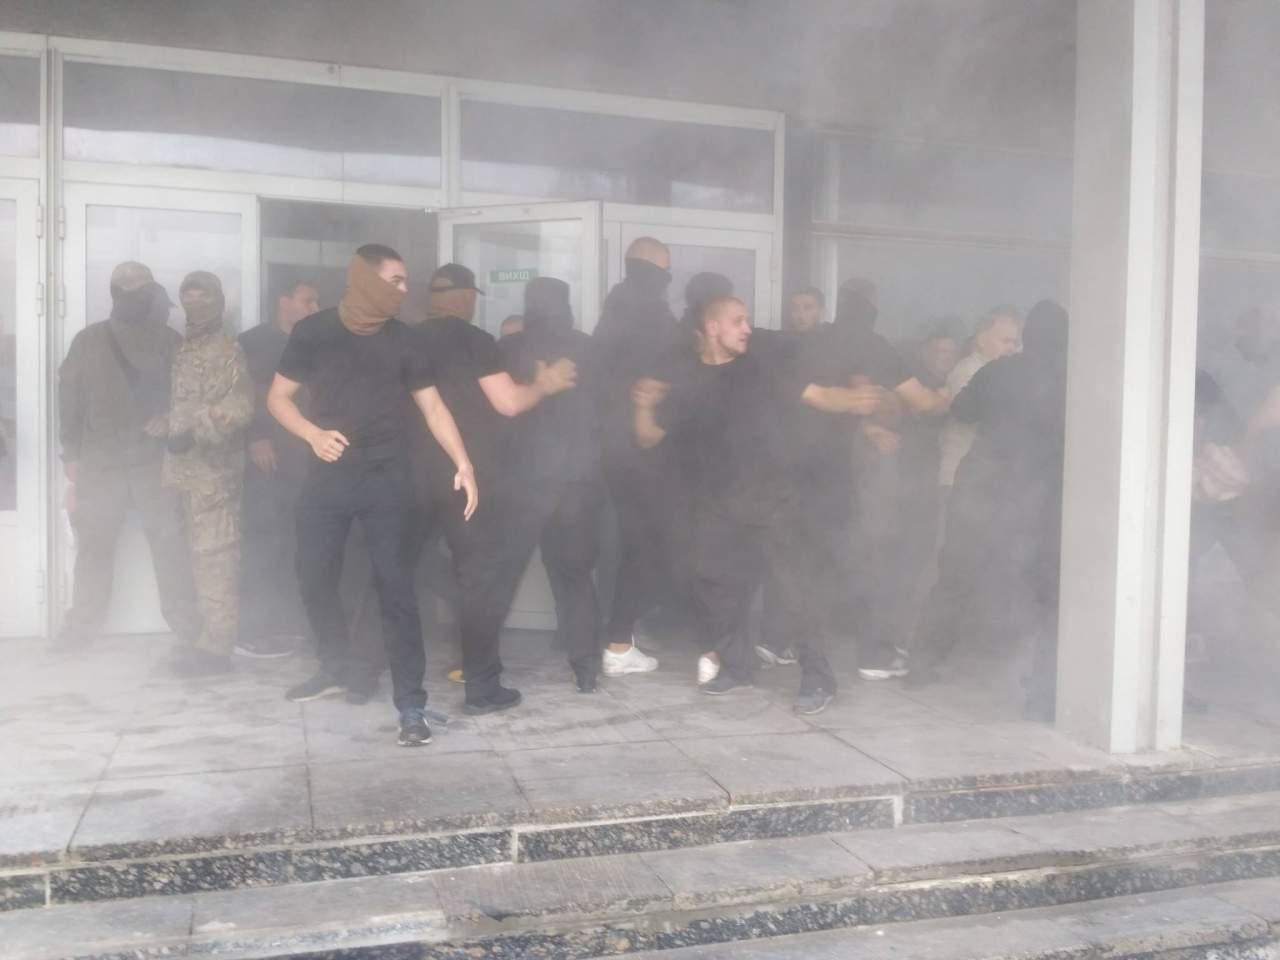 В Киеве титушки захватили госпредприятие «Электронмаш»: около 400 работников оказались на улице (фото)